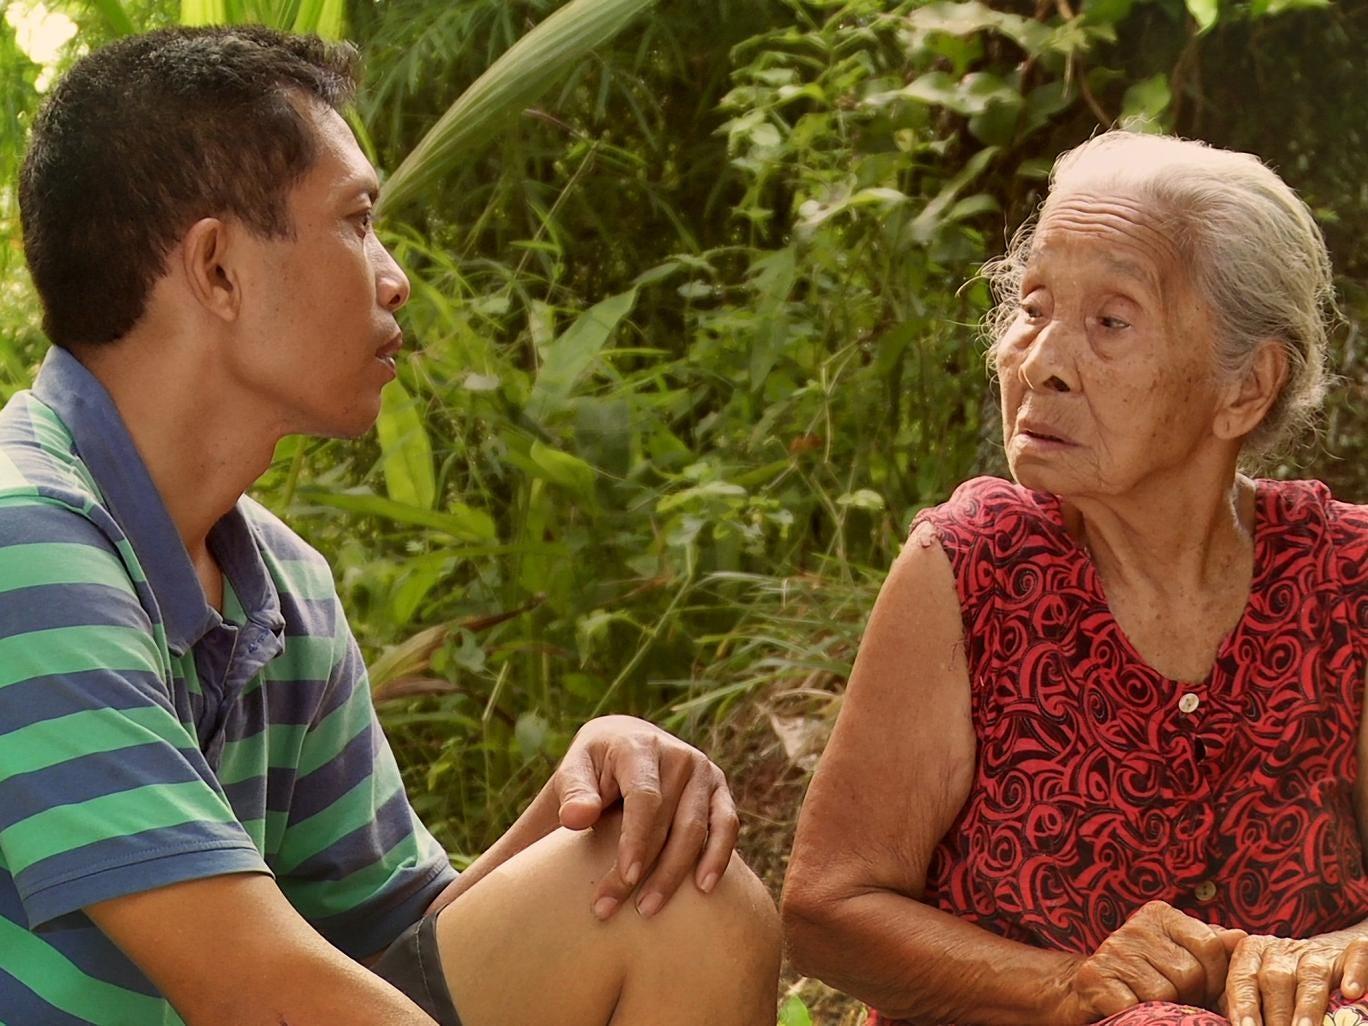 Adi Rukun and his mother, Rohani, in 'The Look of Silence'